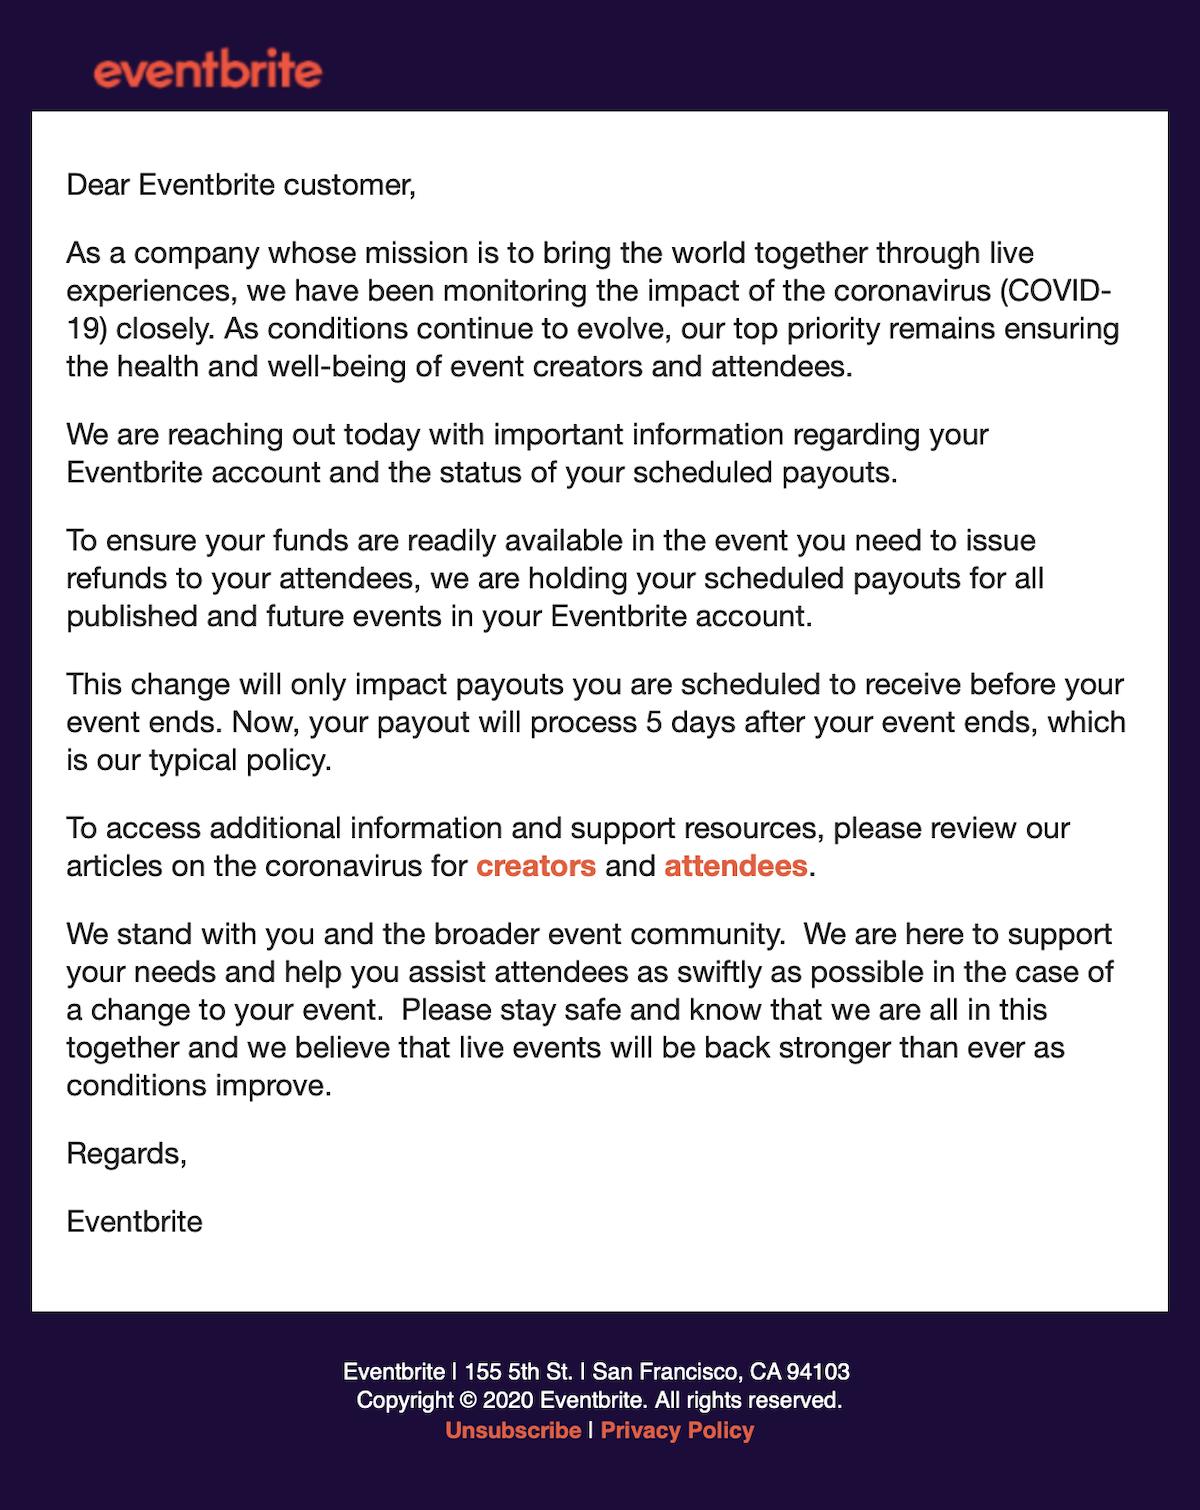 EVENTBRITE Email 13 March 2020 COVID-19 1200pxl